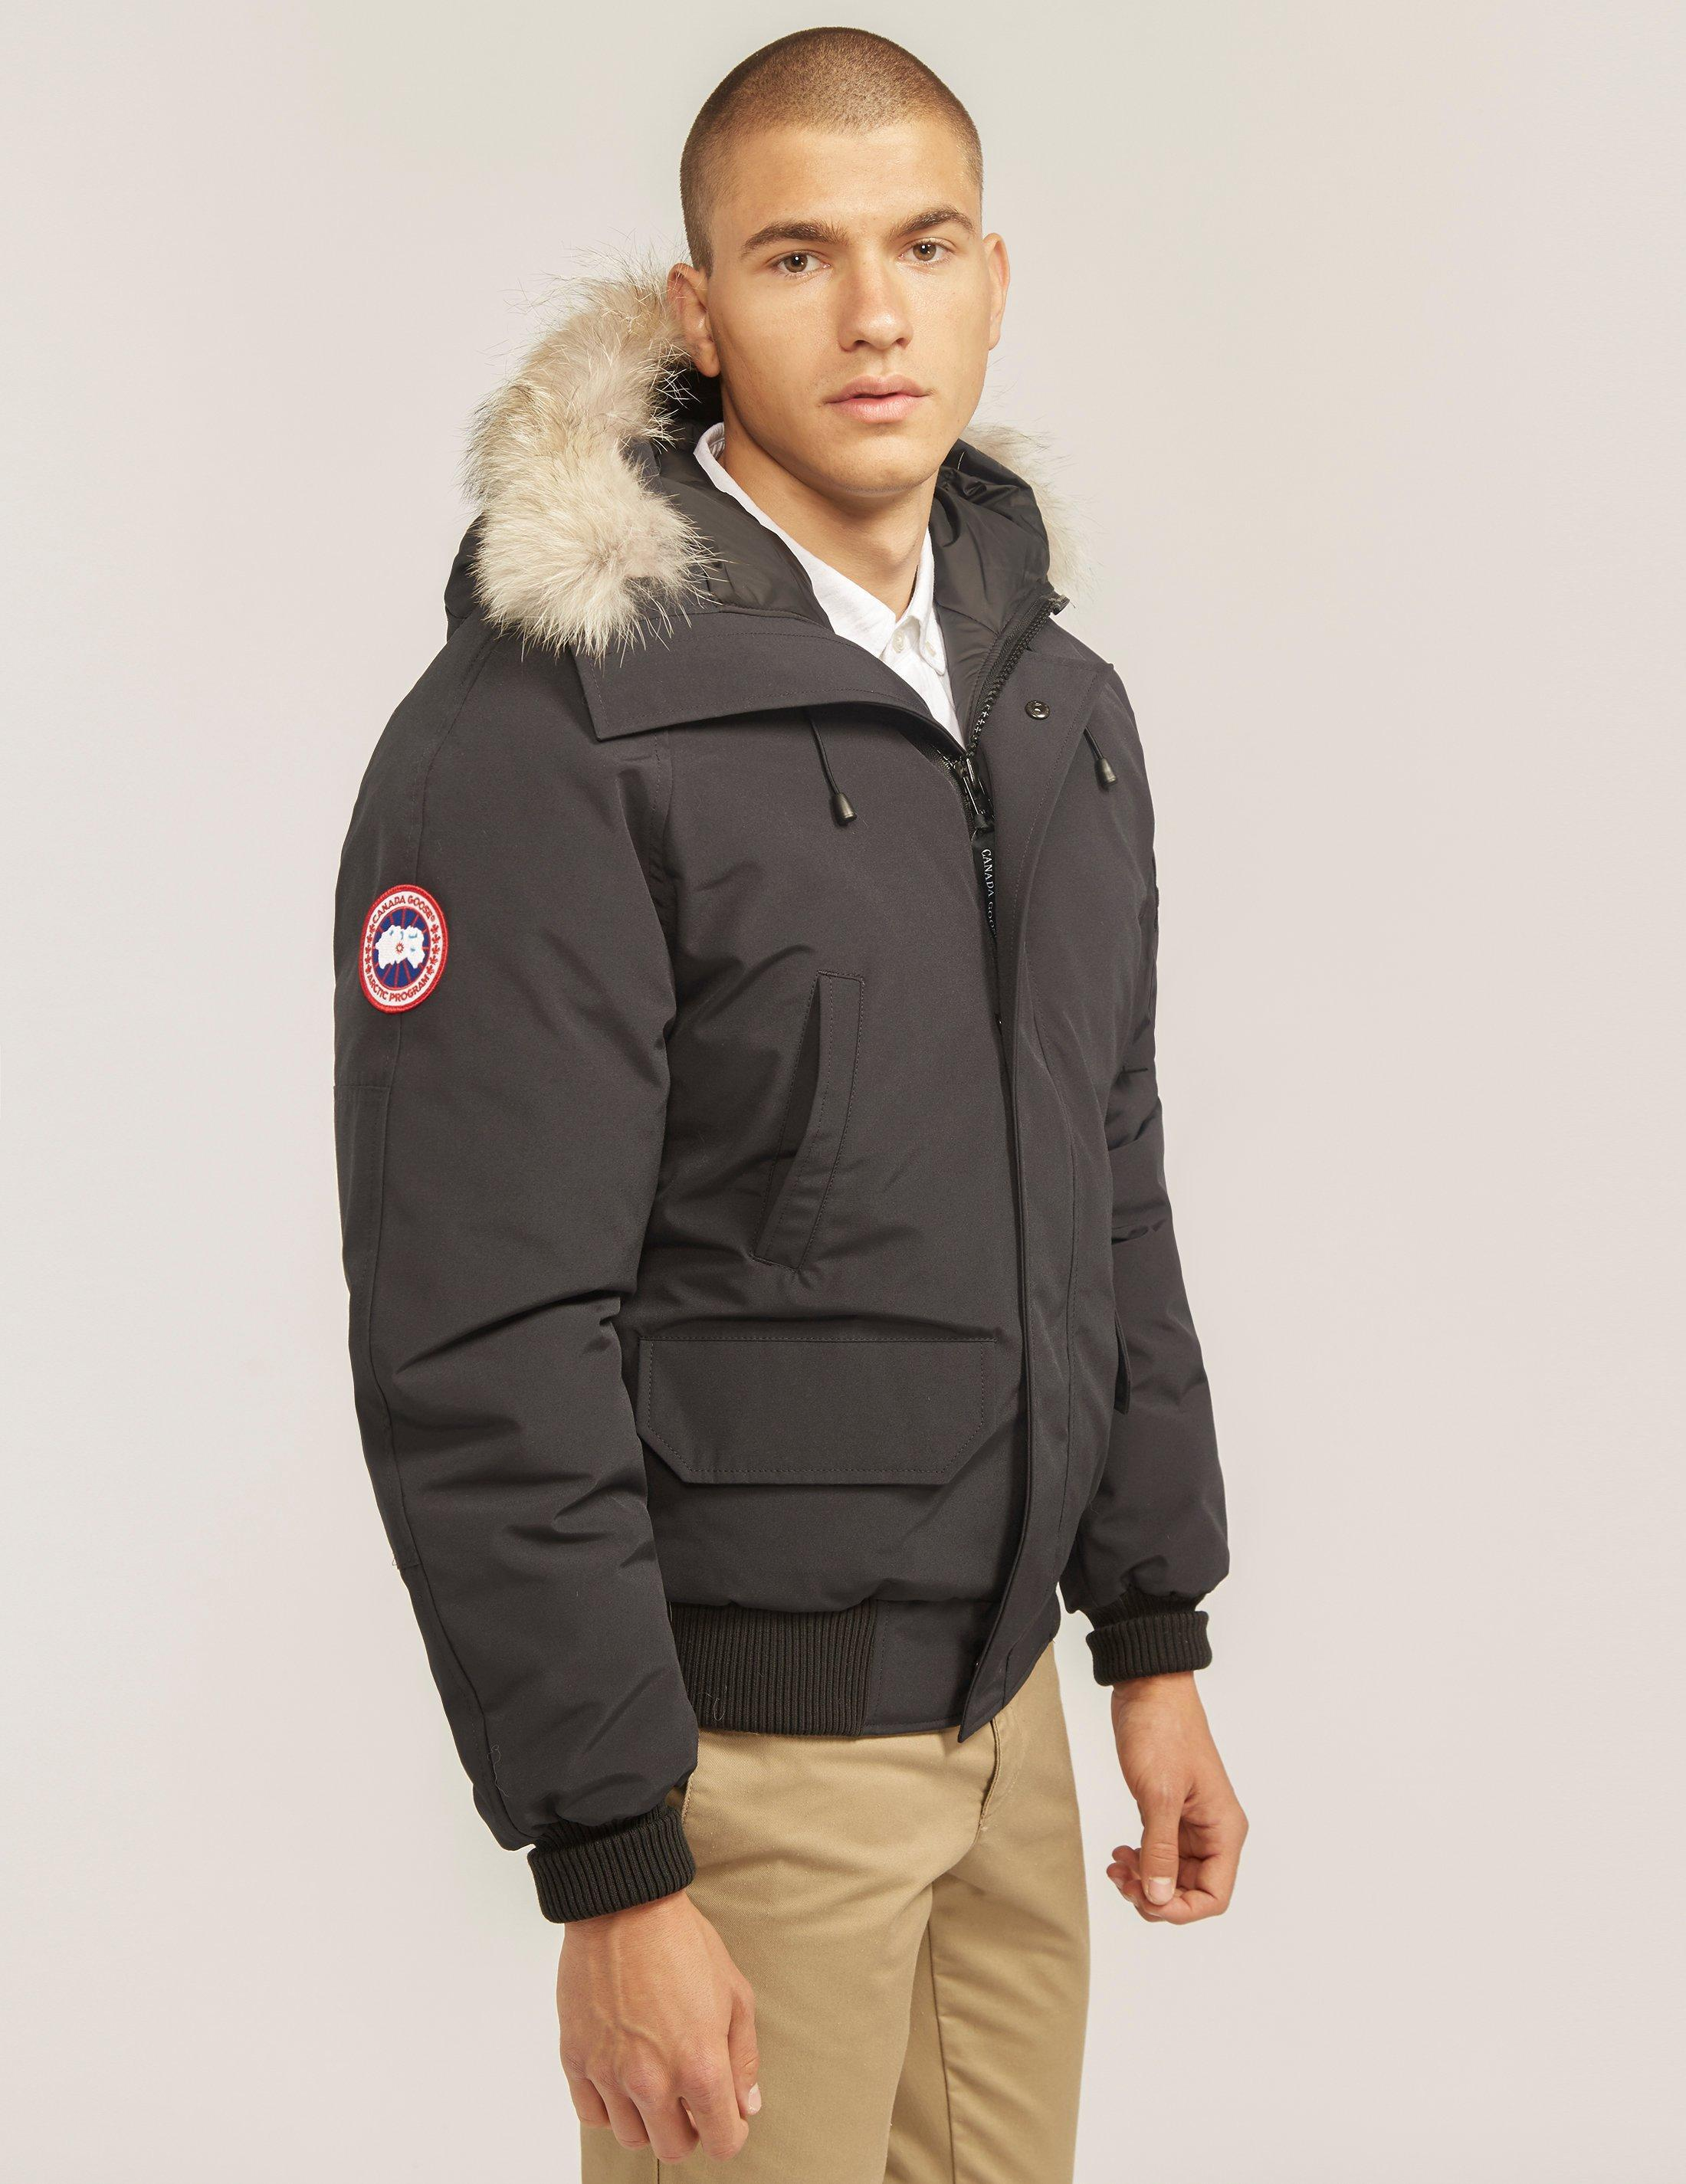 canada goose bomber jacket navy